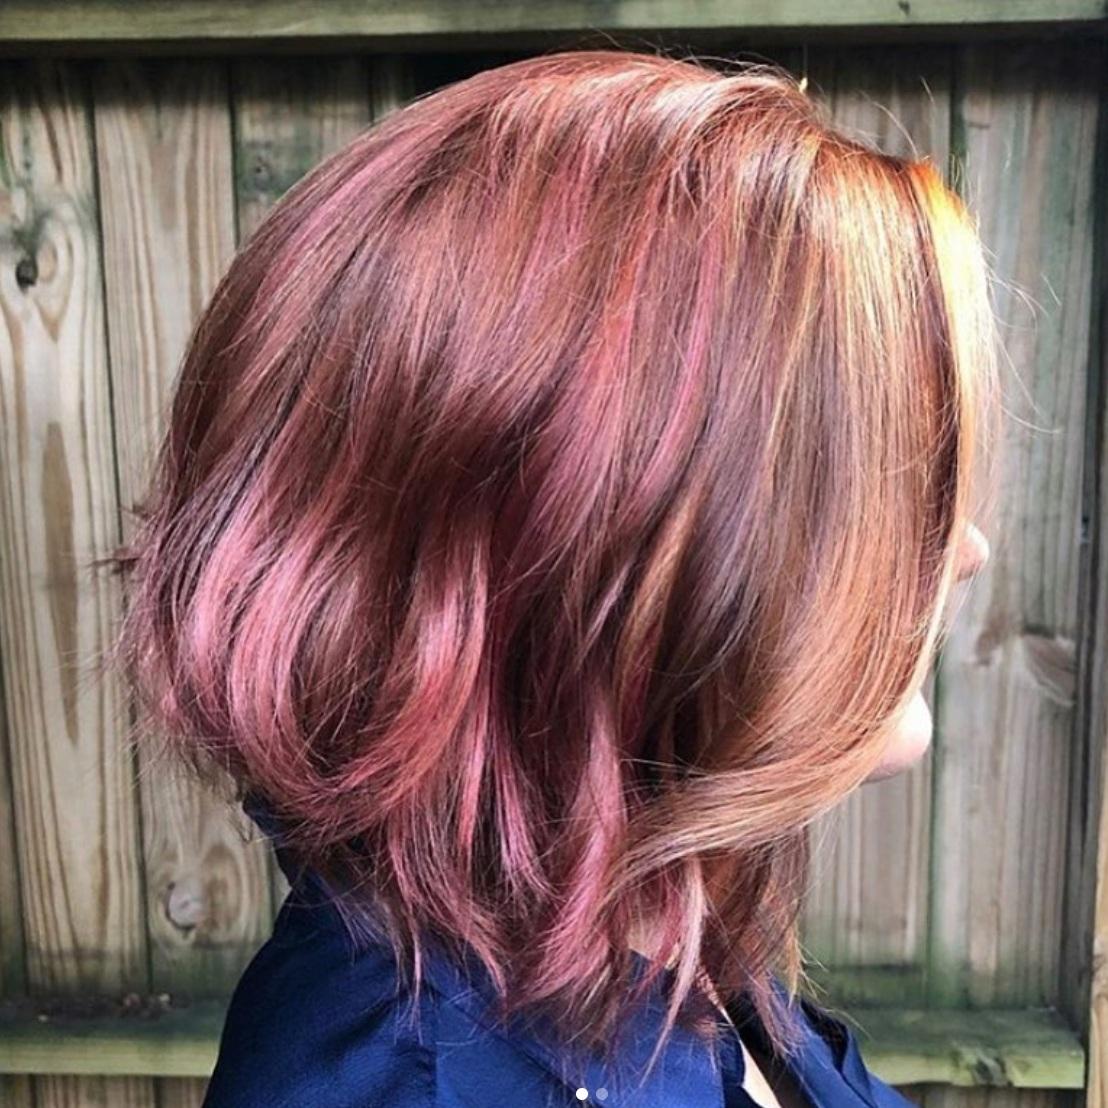 hair by  @locuraroja33